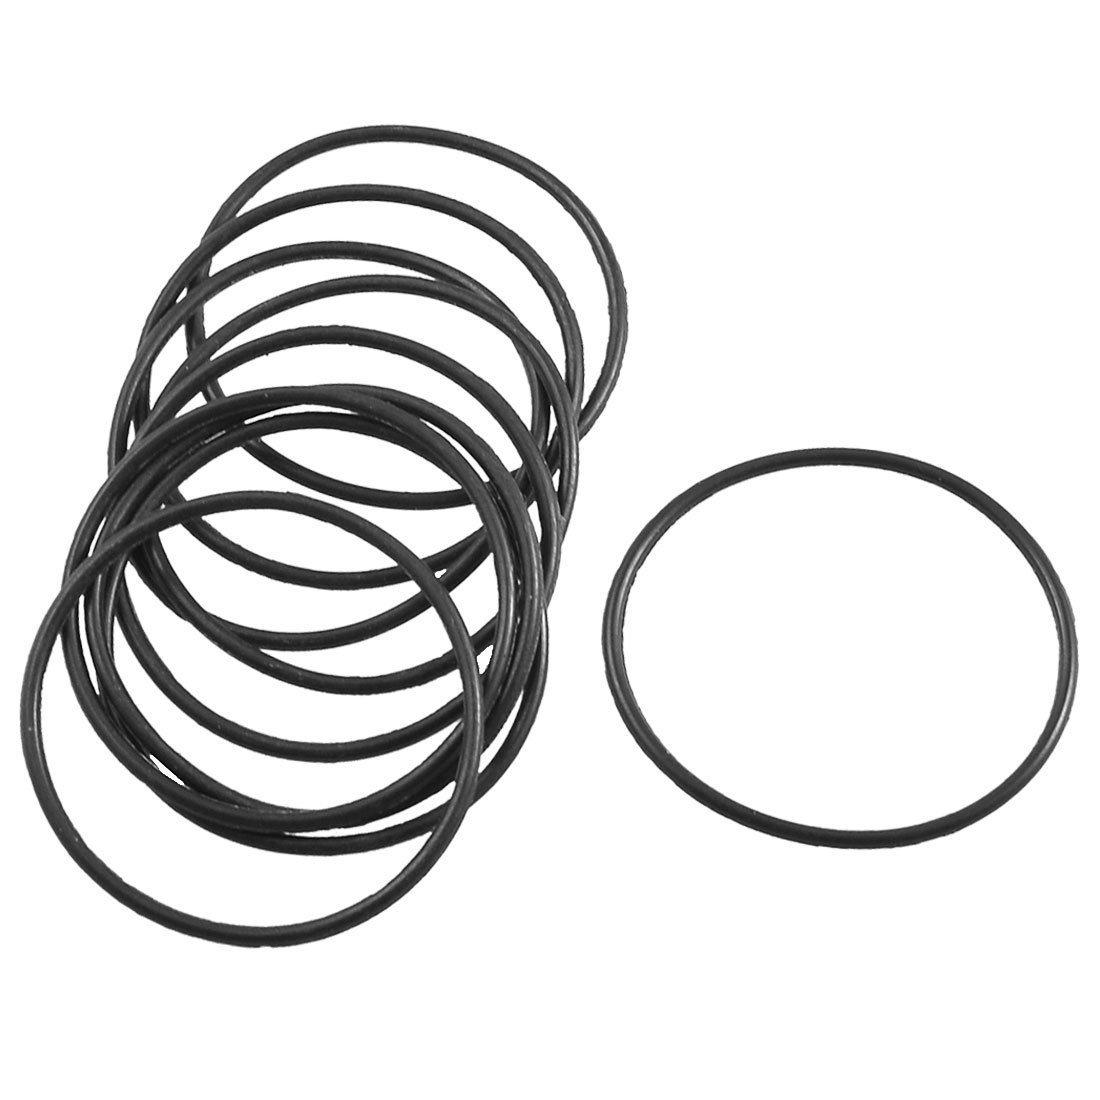 10pcs Negro Goma Sello de aceite O Ring Junta Arandelas De 34mm x 31mm x 1,5mm